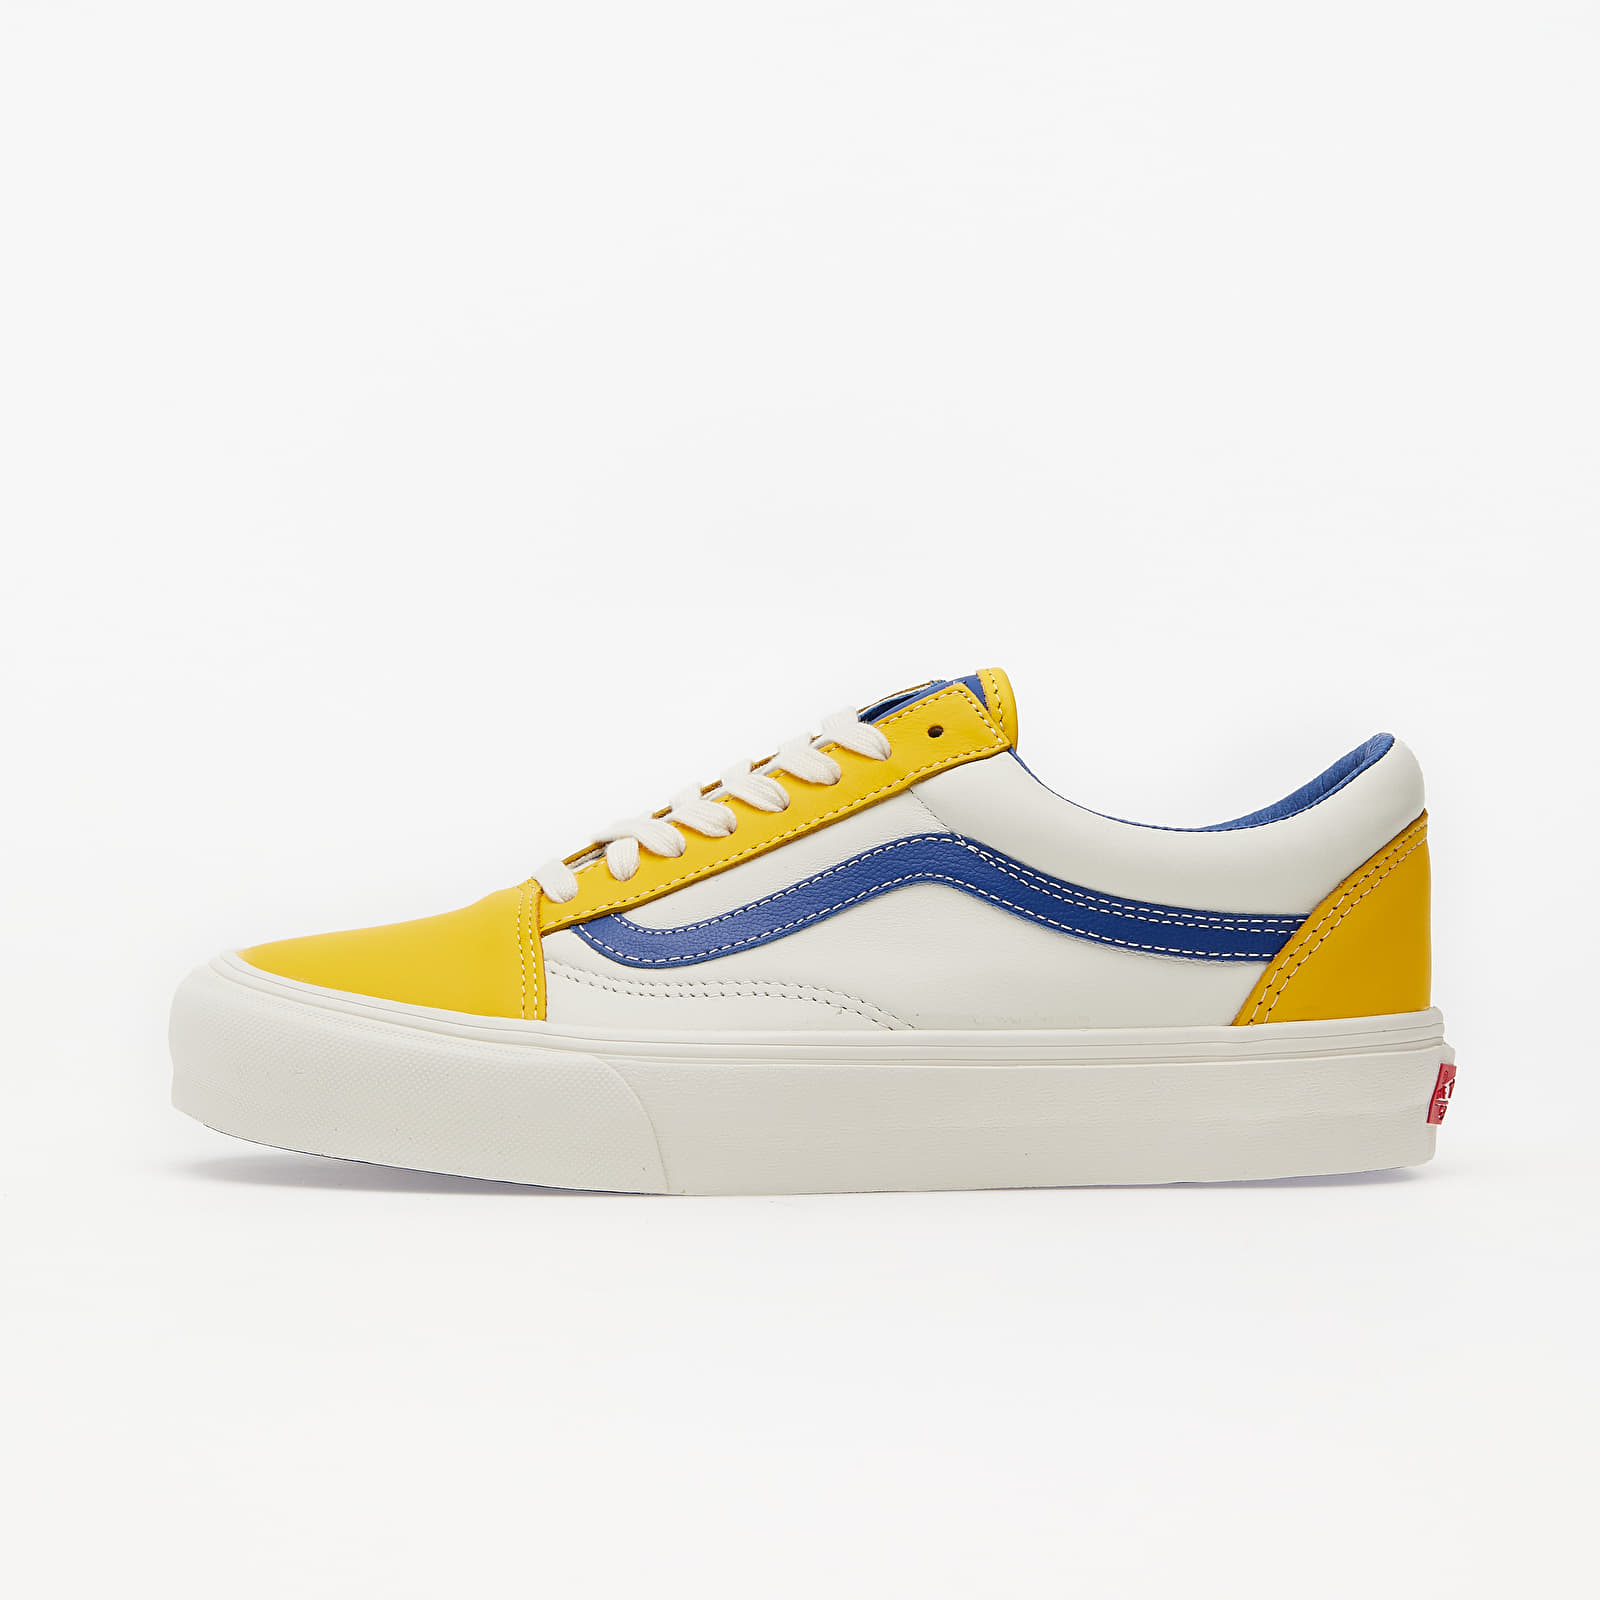 Vans Vault Old Skool LX (Leather) Lemon/ Blue/ True White EUR 40